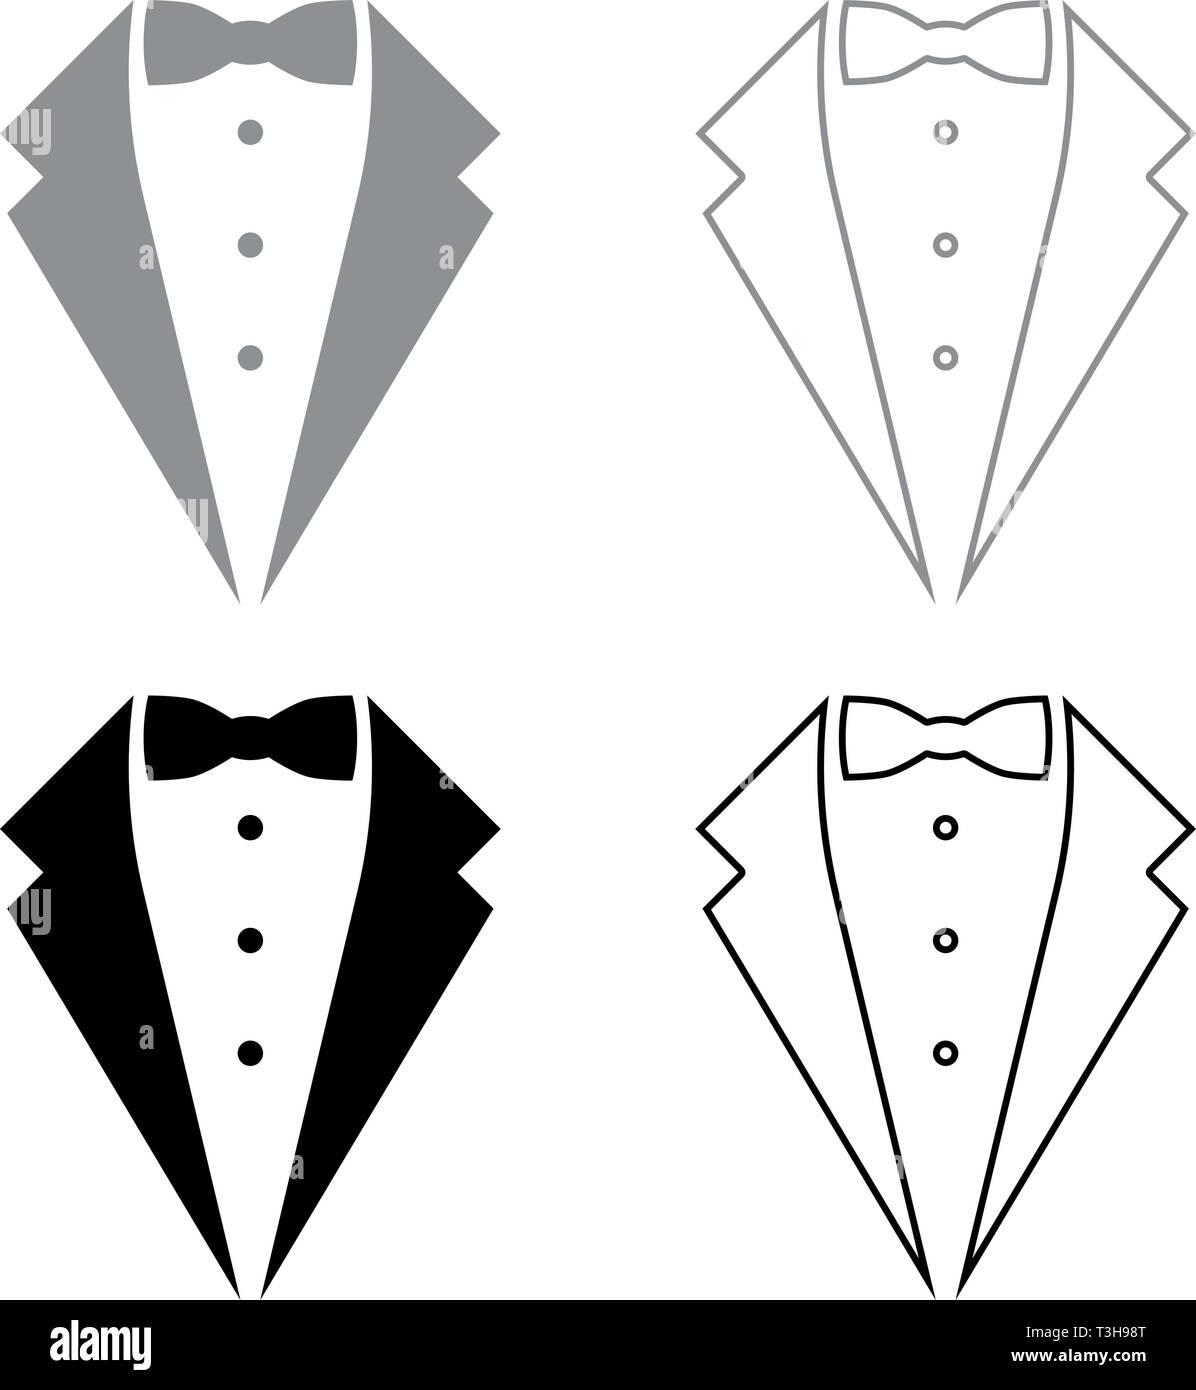 Symbol service dinner jacket bow Tuxedo concept Tux sign Butler gentleman idea Waiter suit icon set black grey color vector illustration flat style - Stock Image